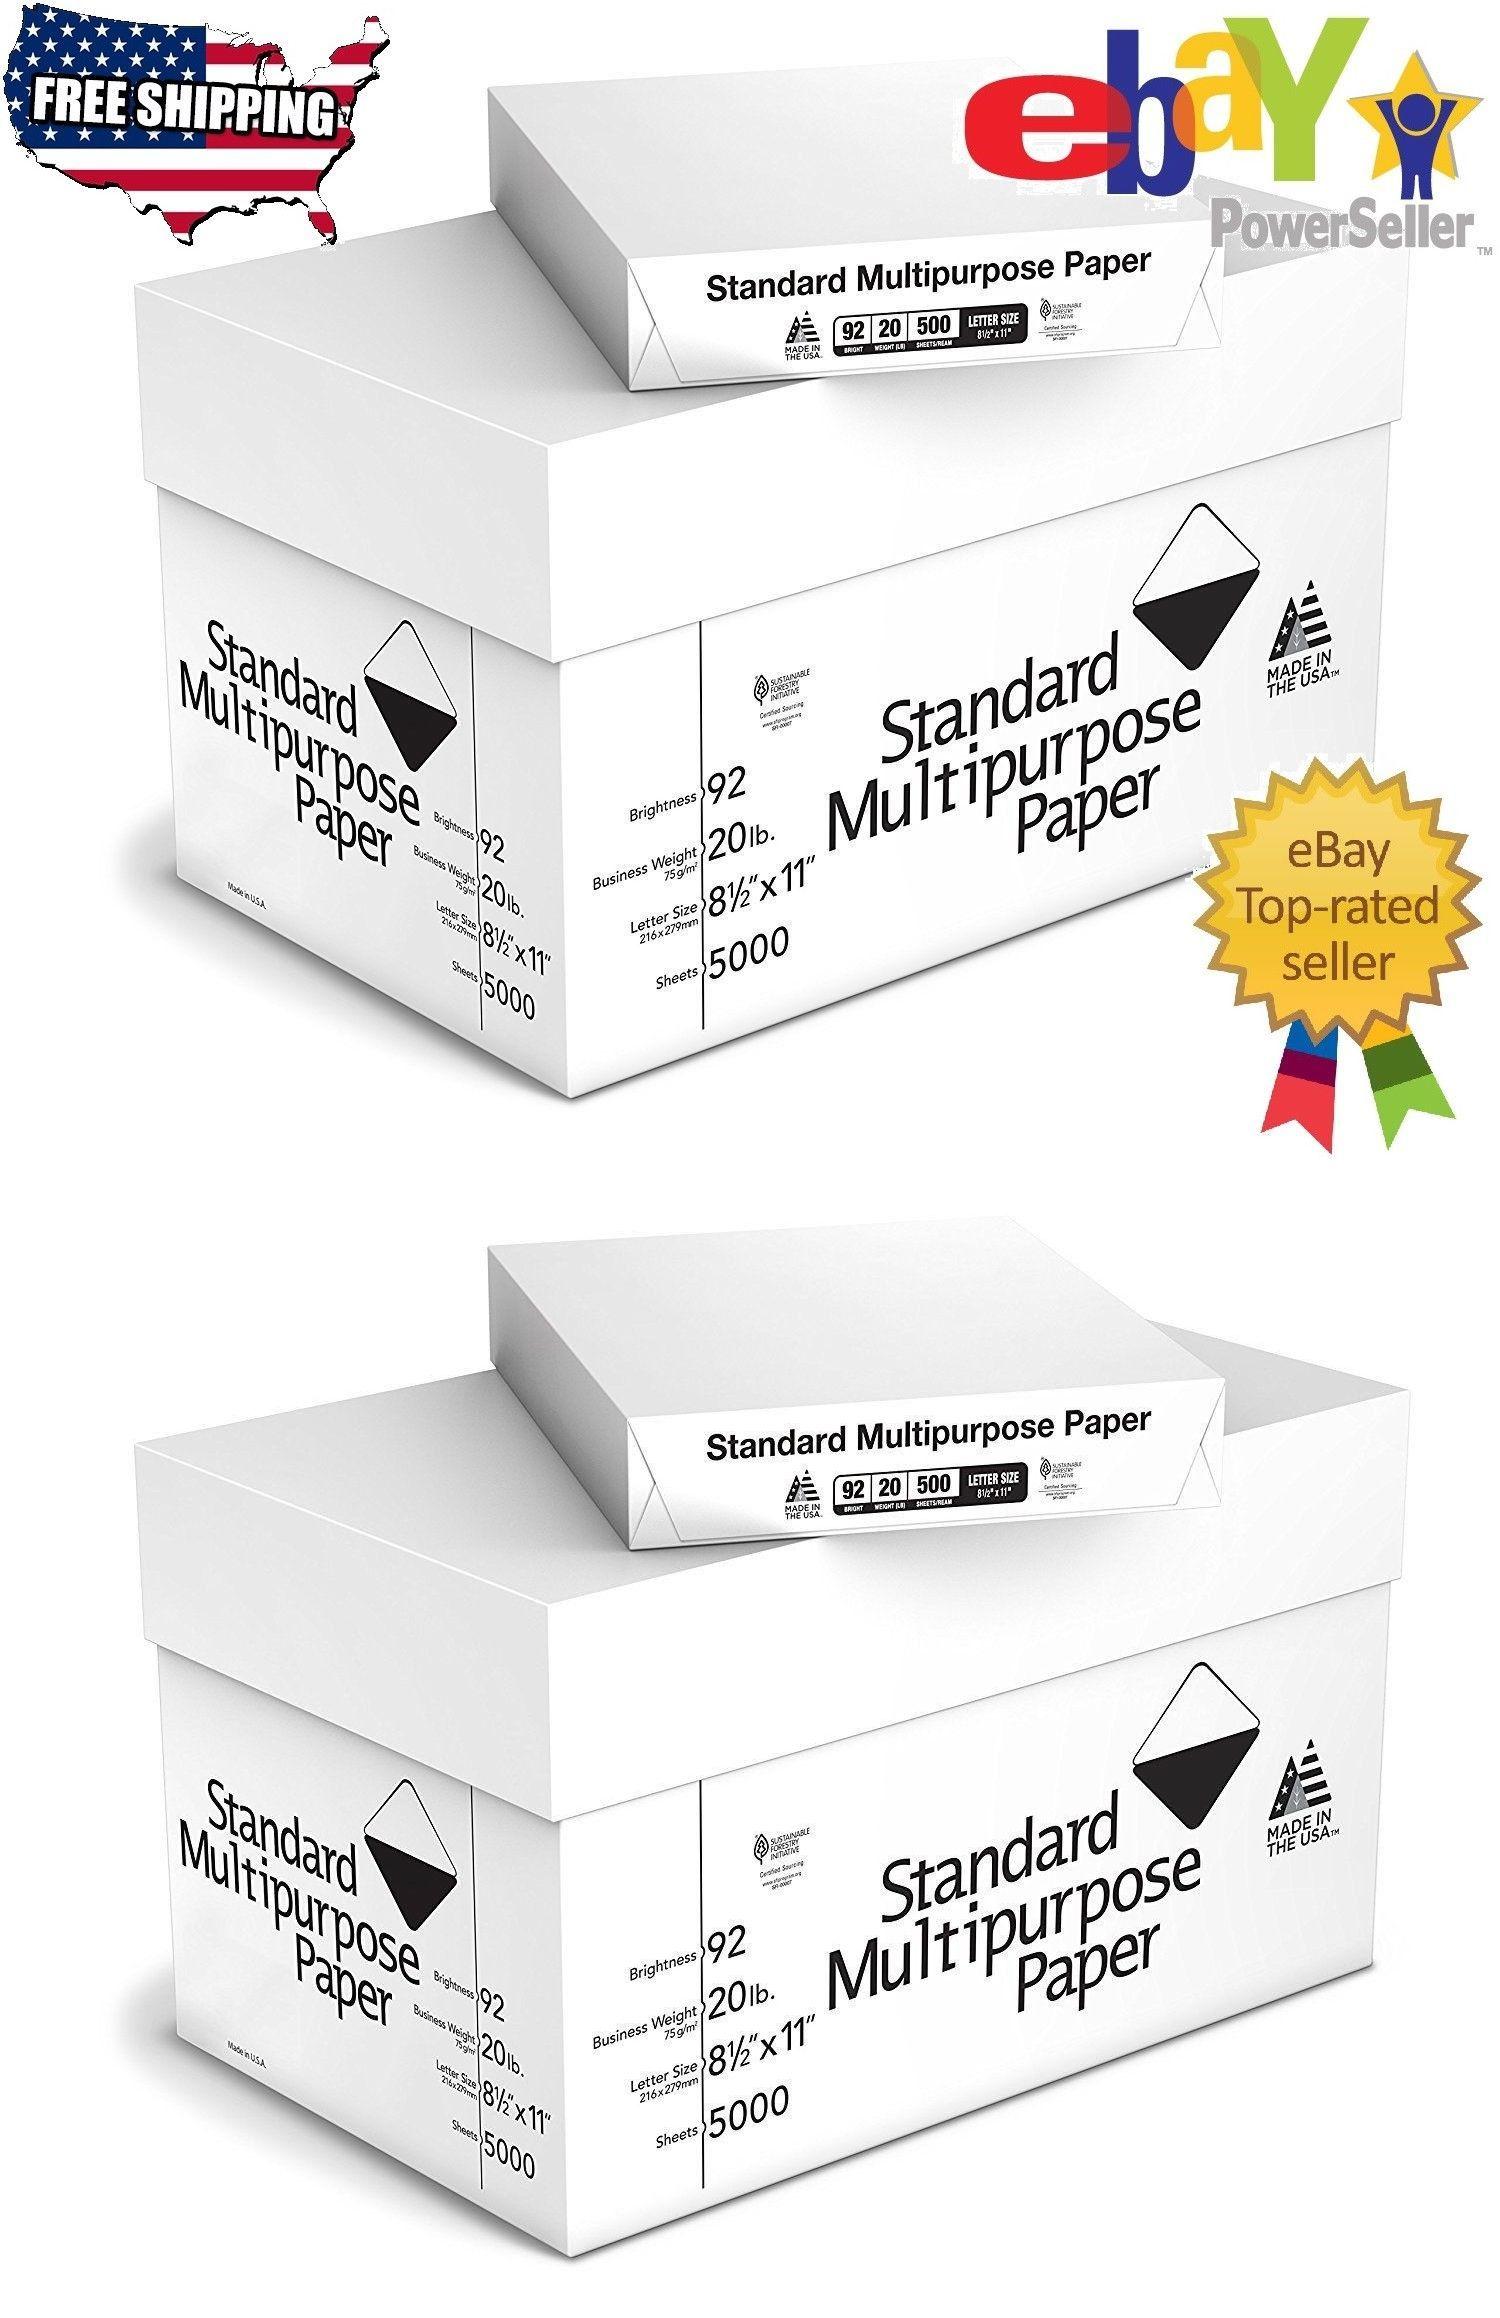 5000 Sheets Multipurpose Printer Copy Paper White 8 1 2 X 11 10 Reams Case Ebay Copy Paper Printer Paper Printer